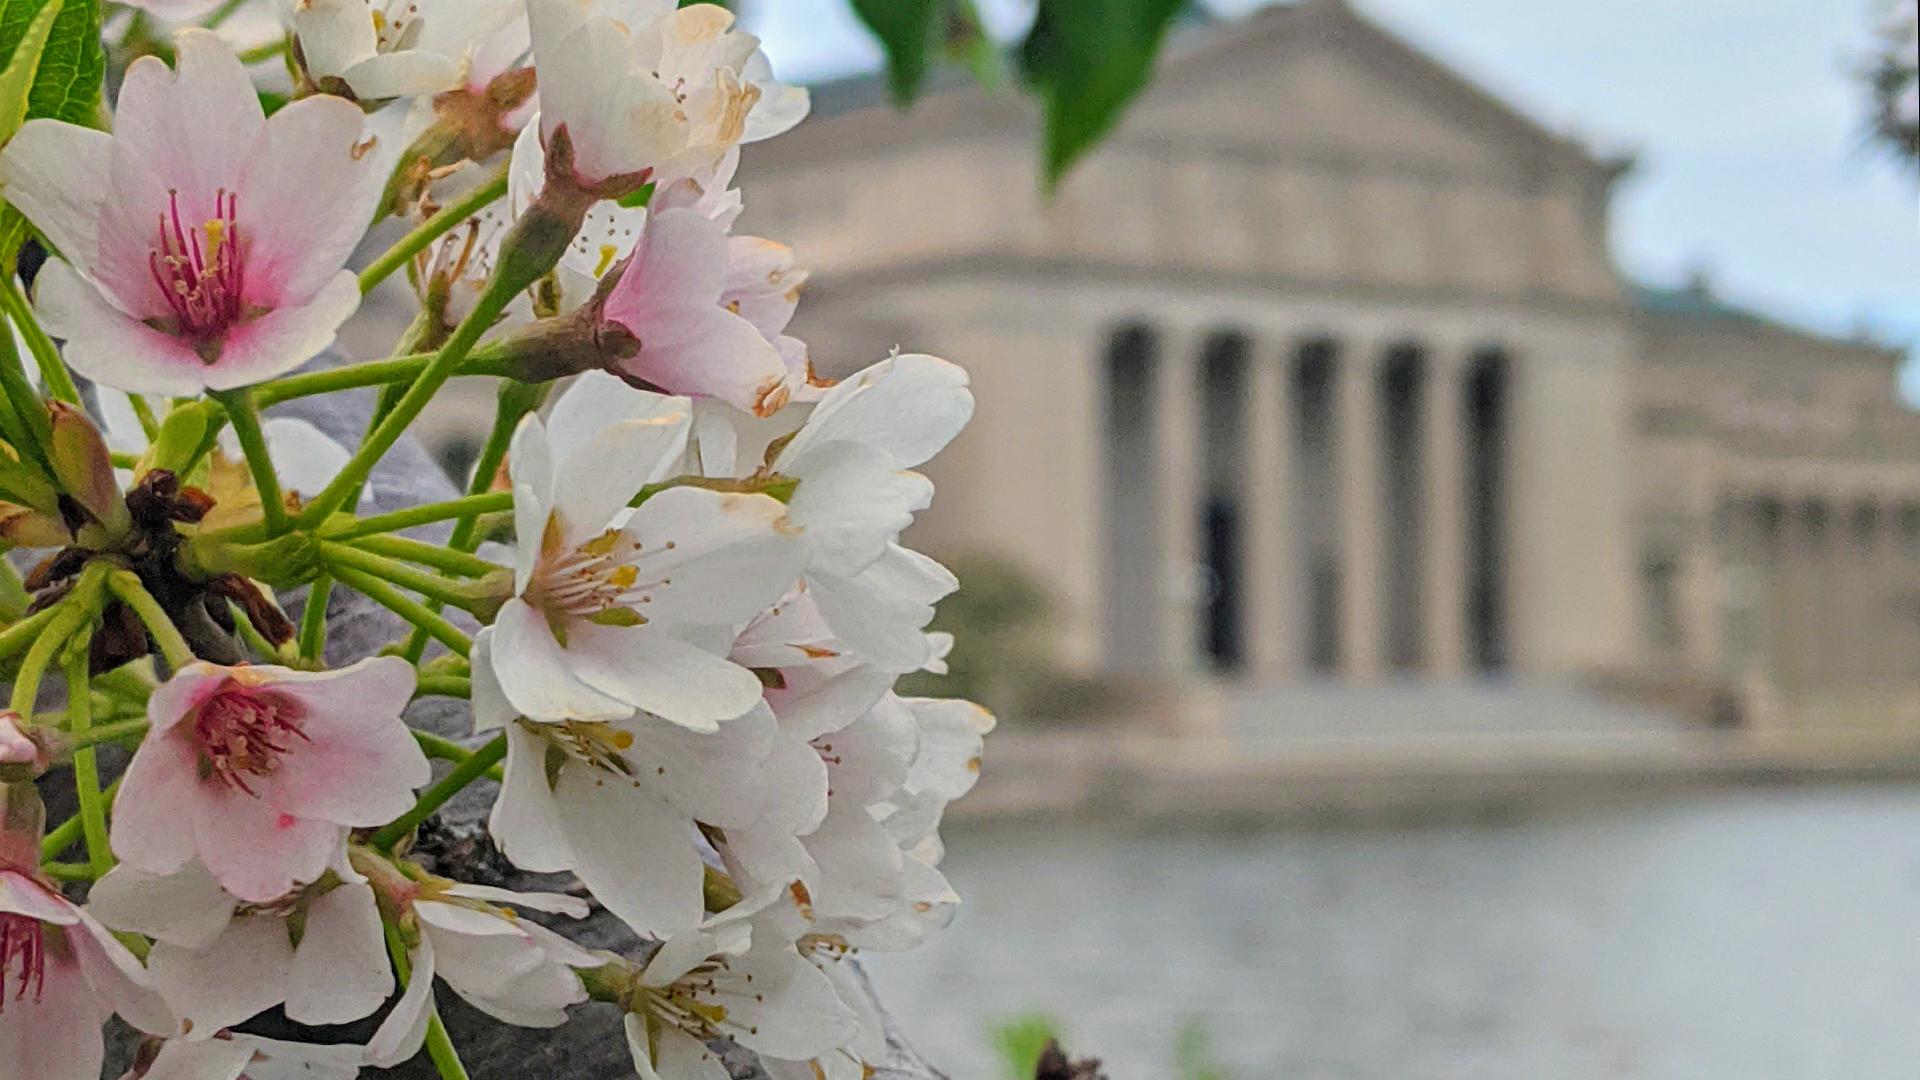 5/13/20 Jackson Park Cherry Blossoms 1